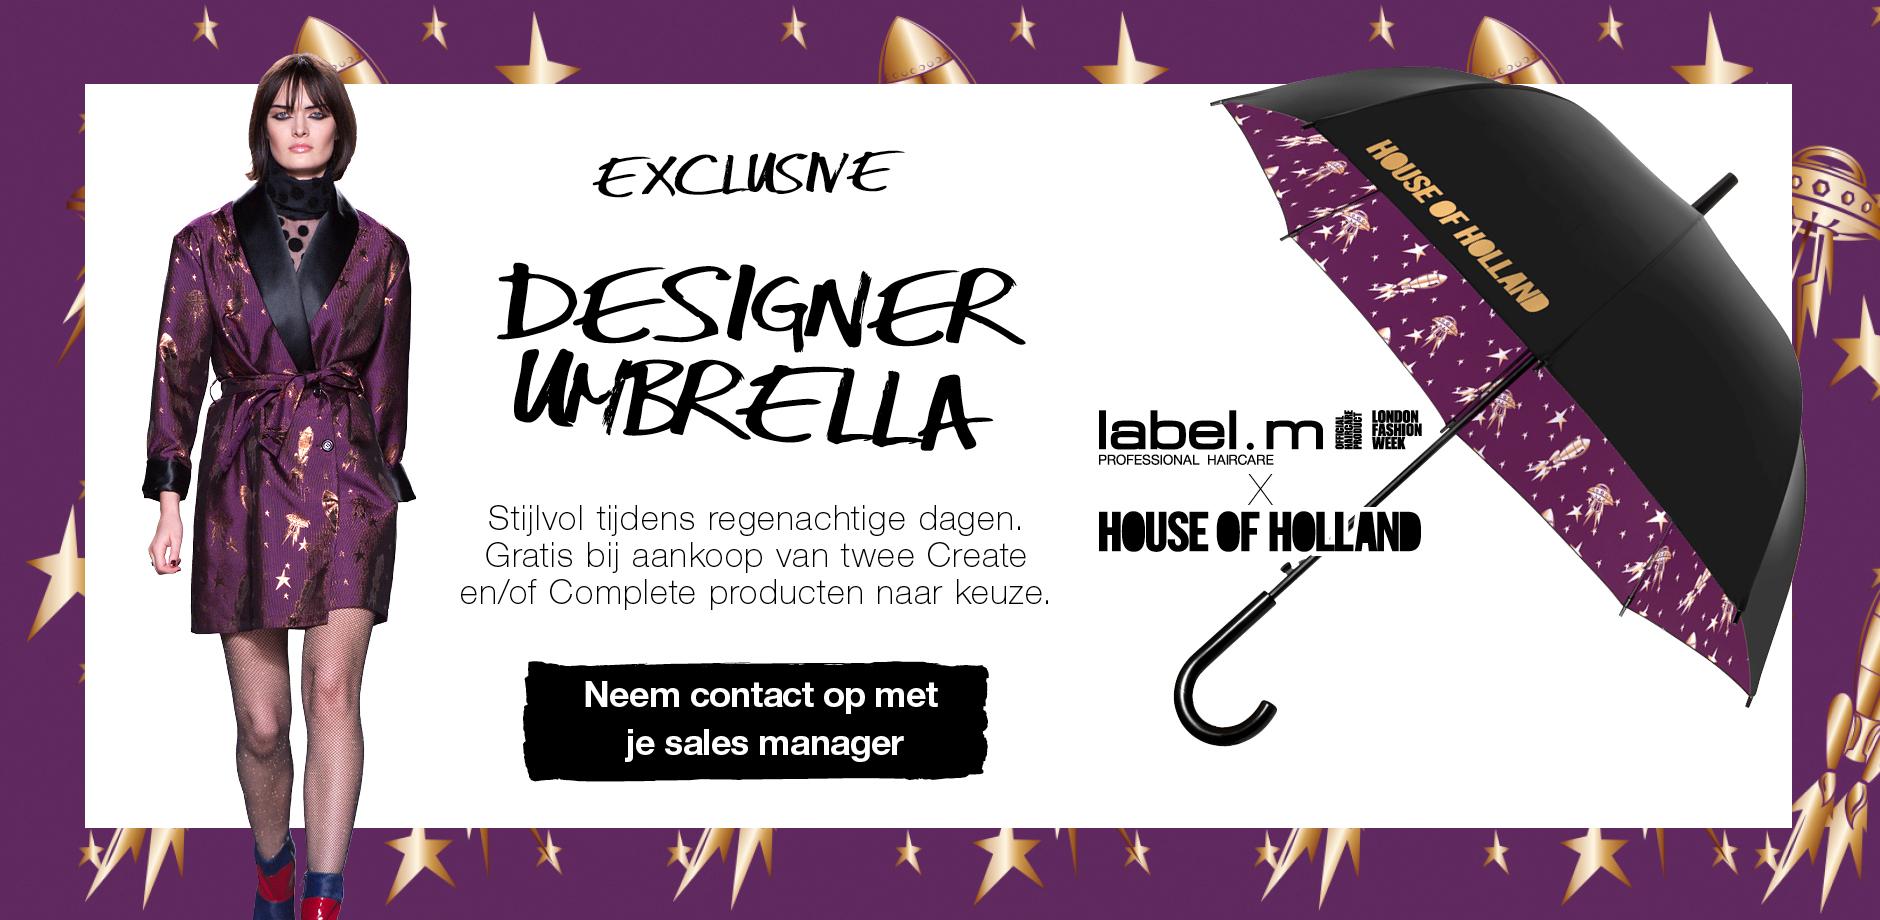 House of Holland Umbrella